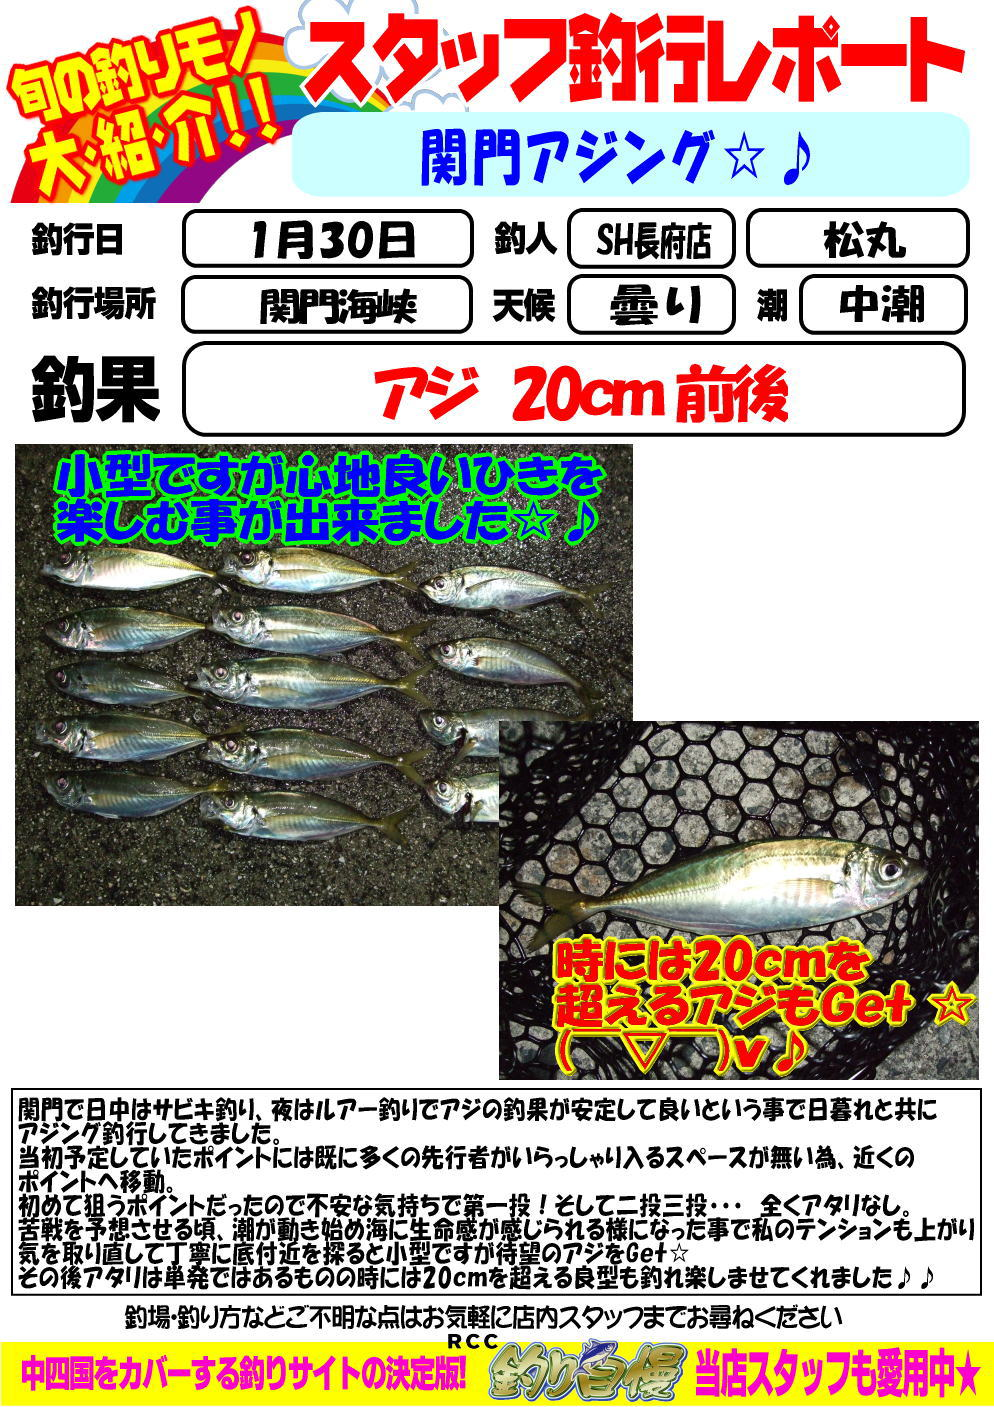 http://www.e-angle.co.jp/shop/blog/blog-choufu-20170131matumaru.jpg